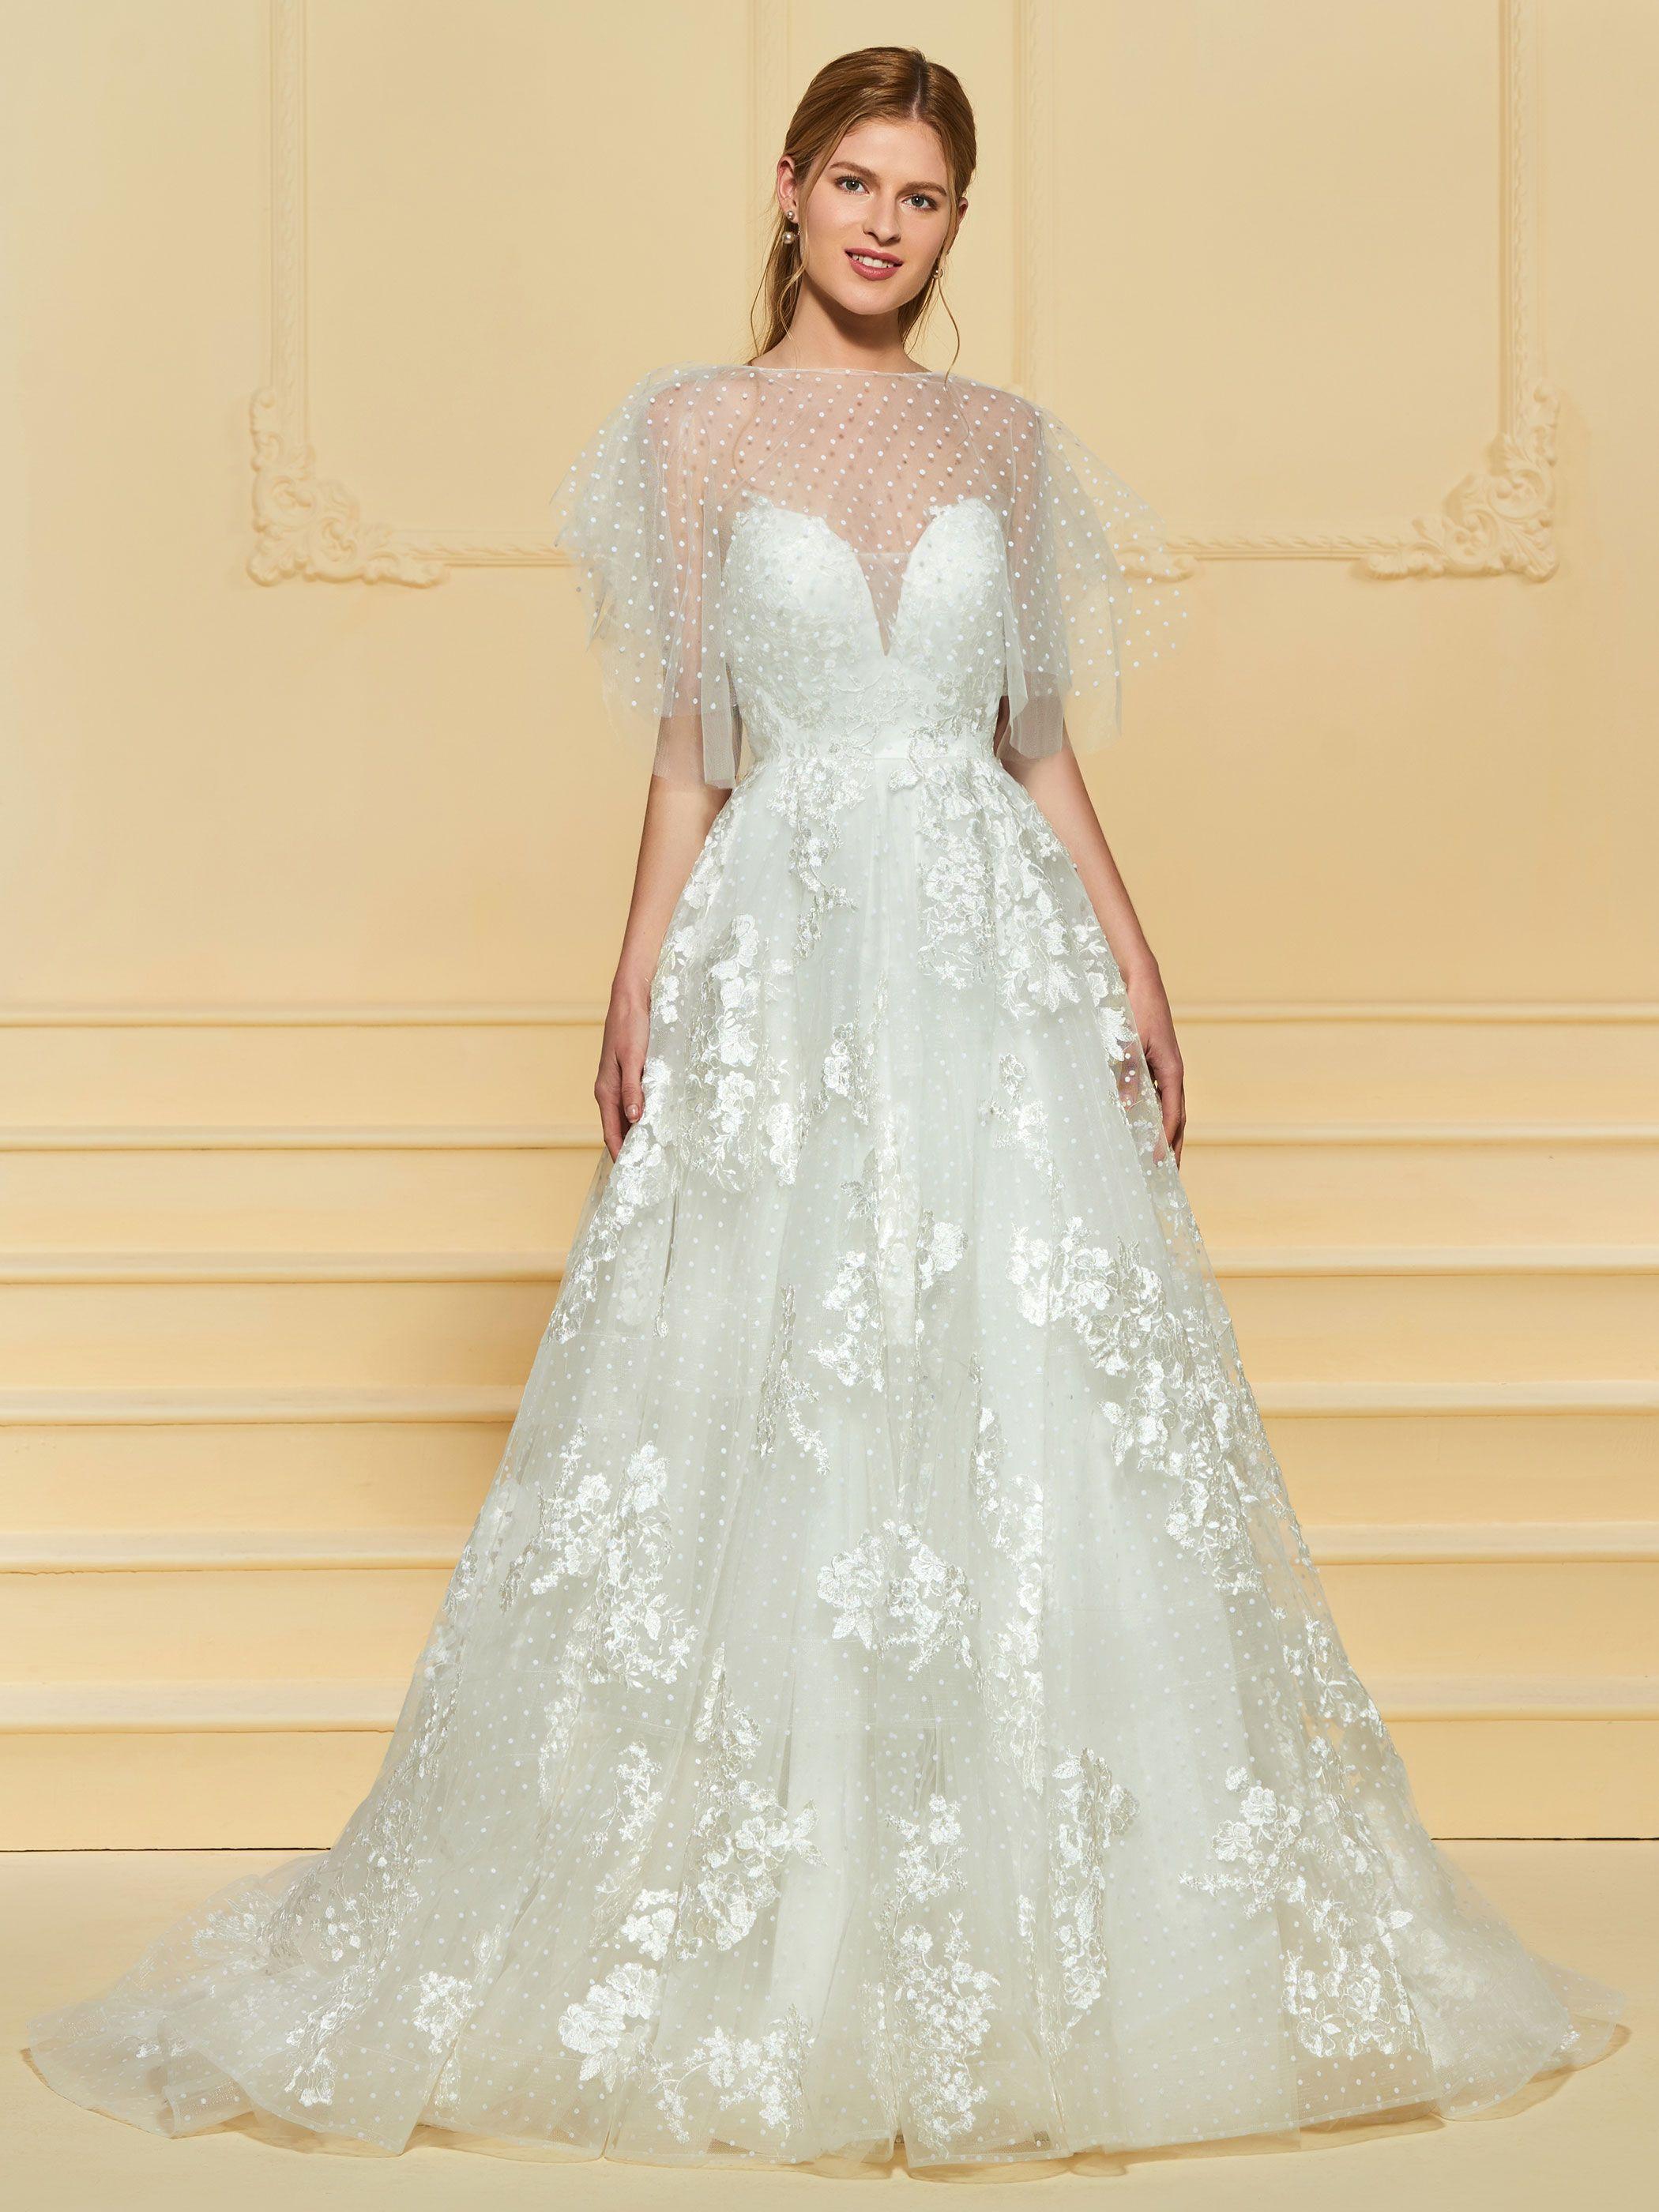 Lace Appliques Wedding Dress With Shawl Lace Applique Wedding Dress Applique Wedding Dress Wedding Dresses [ 2800 x 2100 Pixel ]